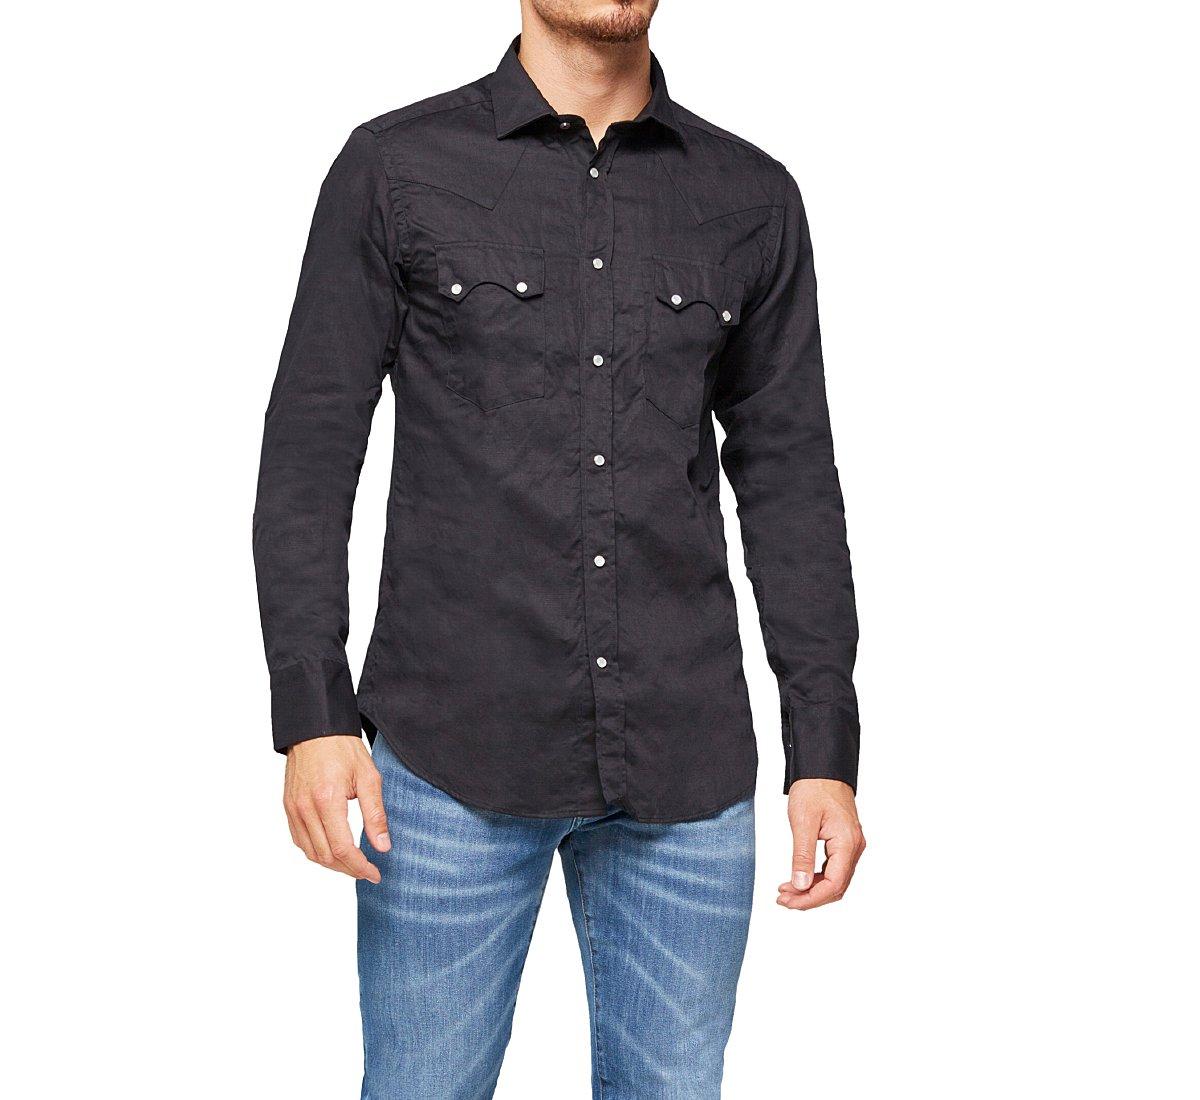 Western-style shirt